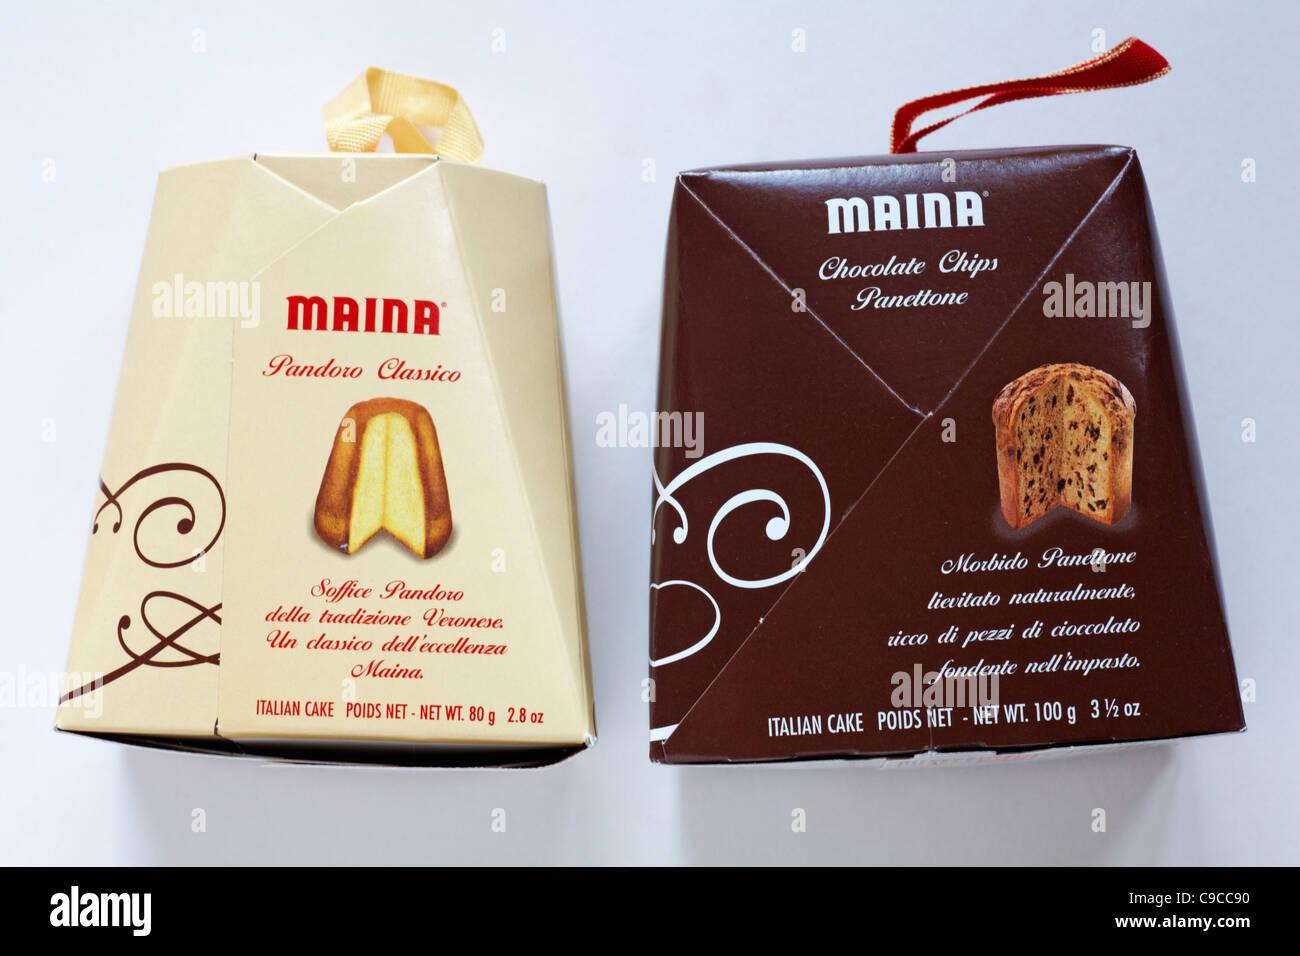 Maina Pandoro Classico Box Und Box Maina Schokolade Spane Panettone